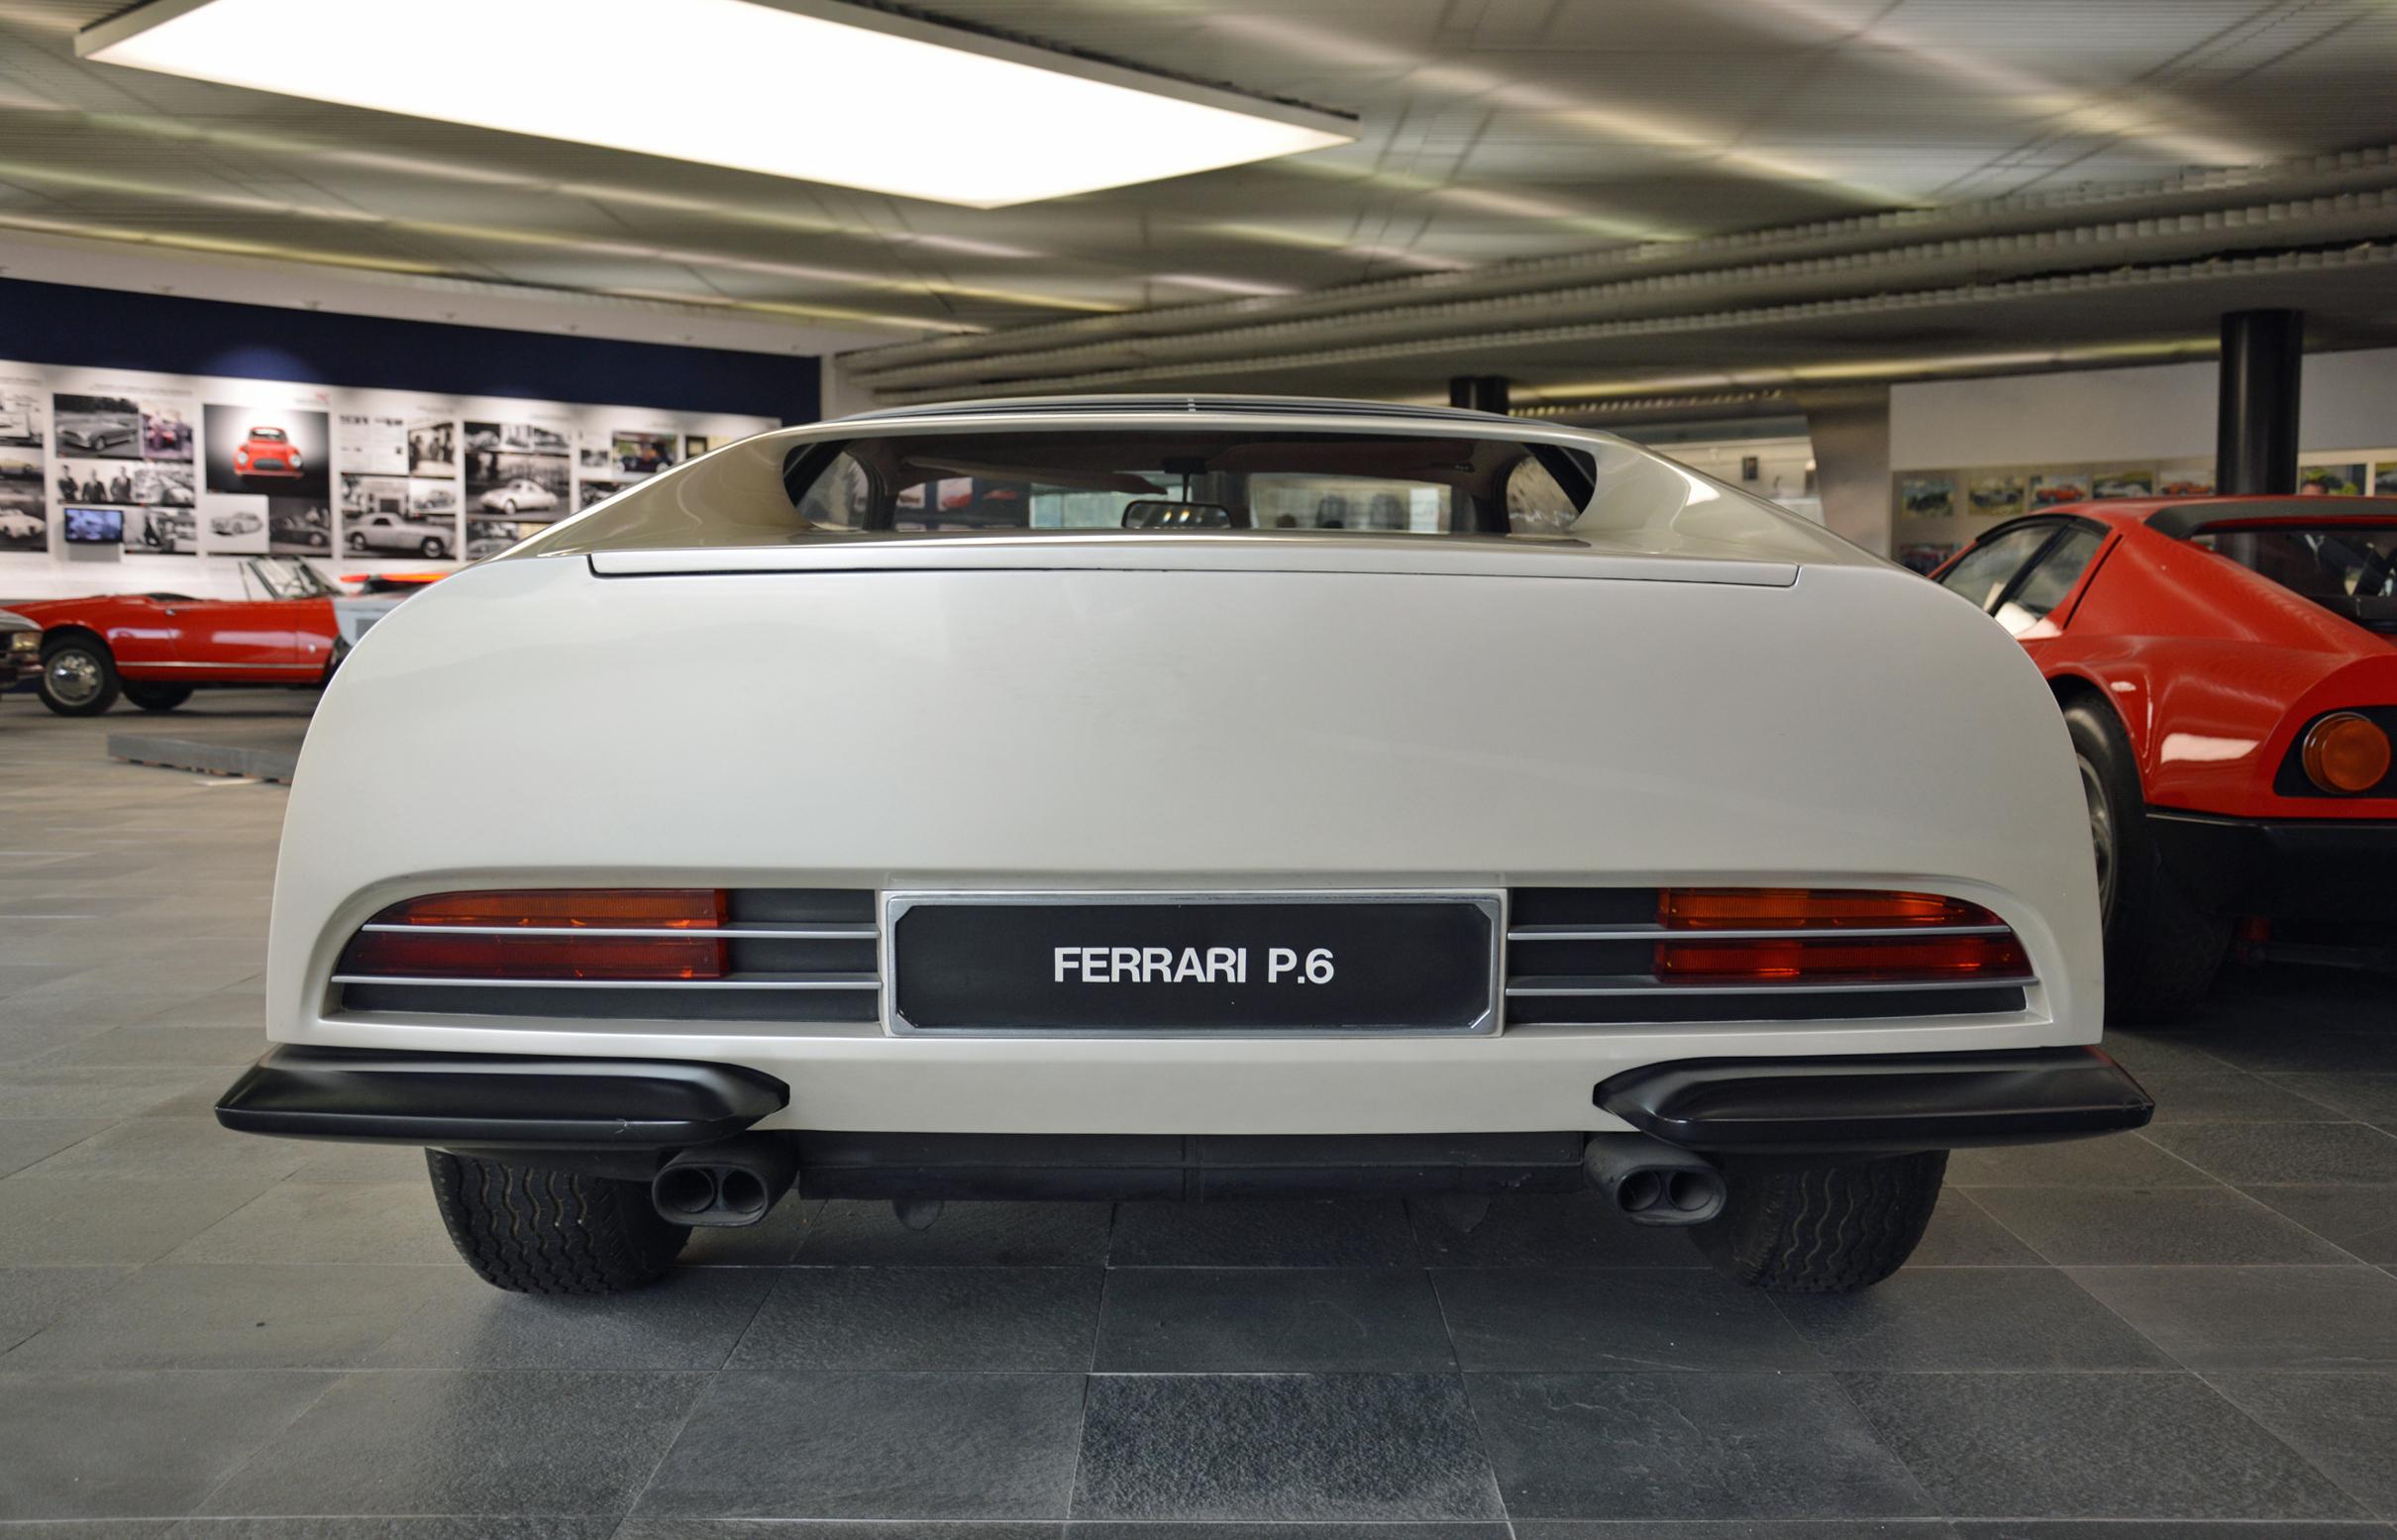 1968 ferrari p6 prototype rear